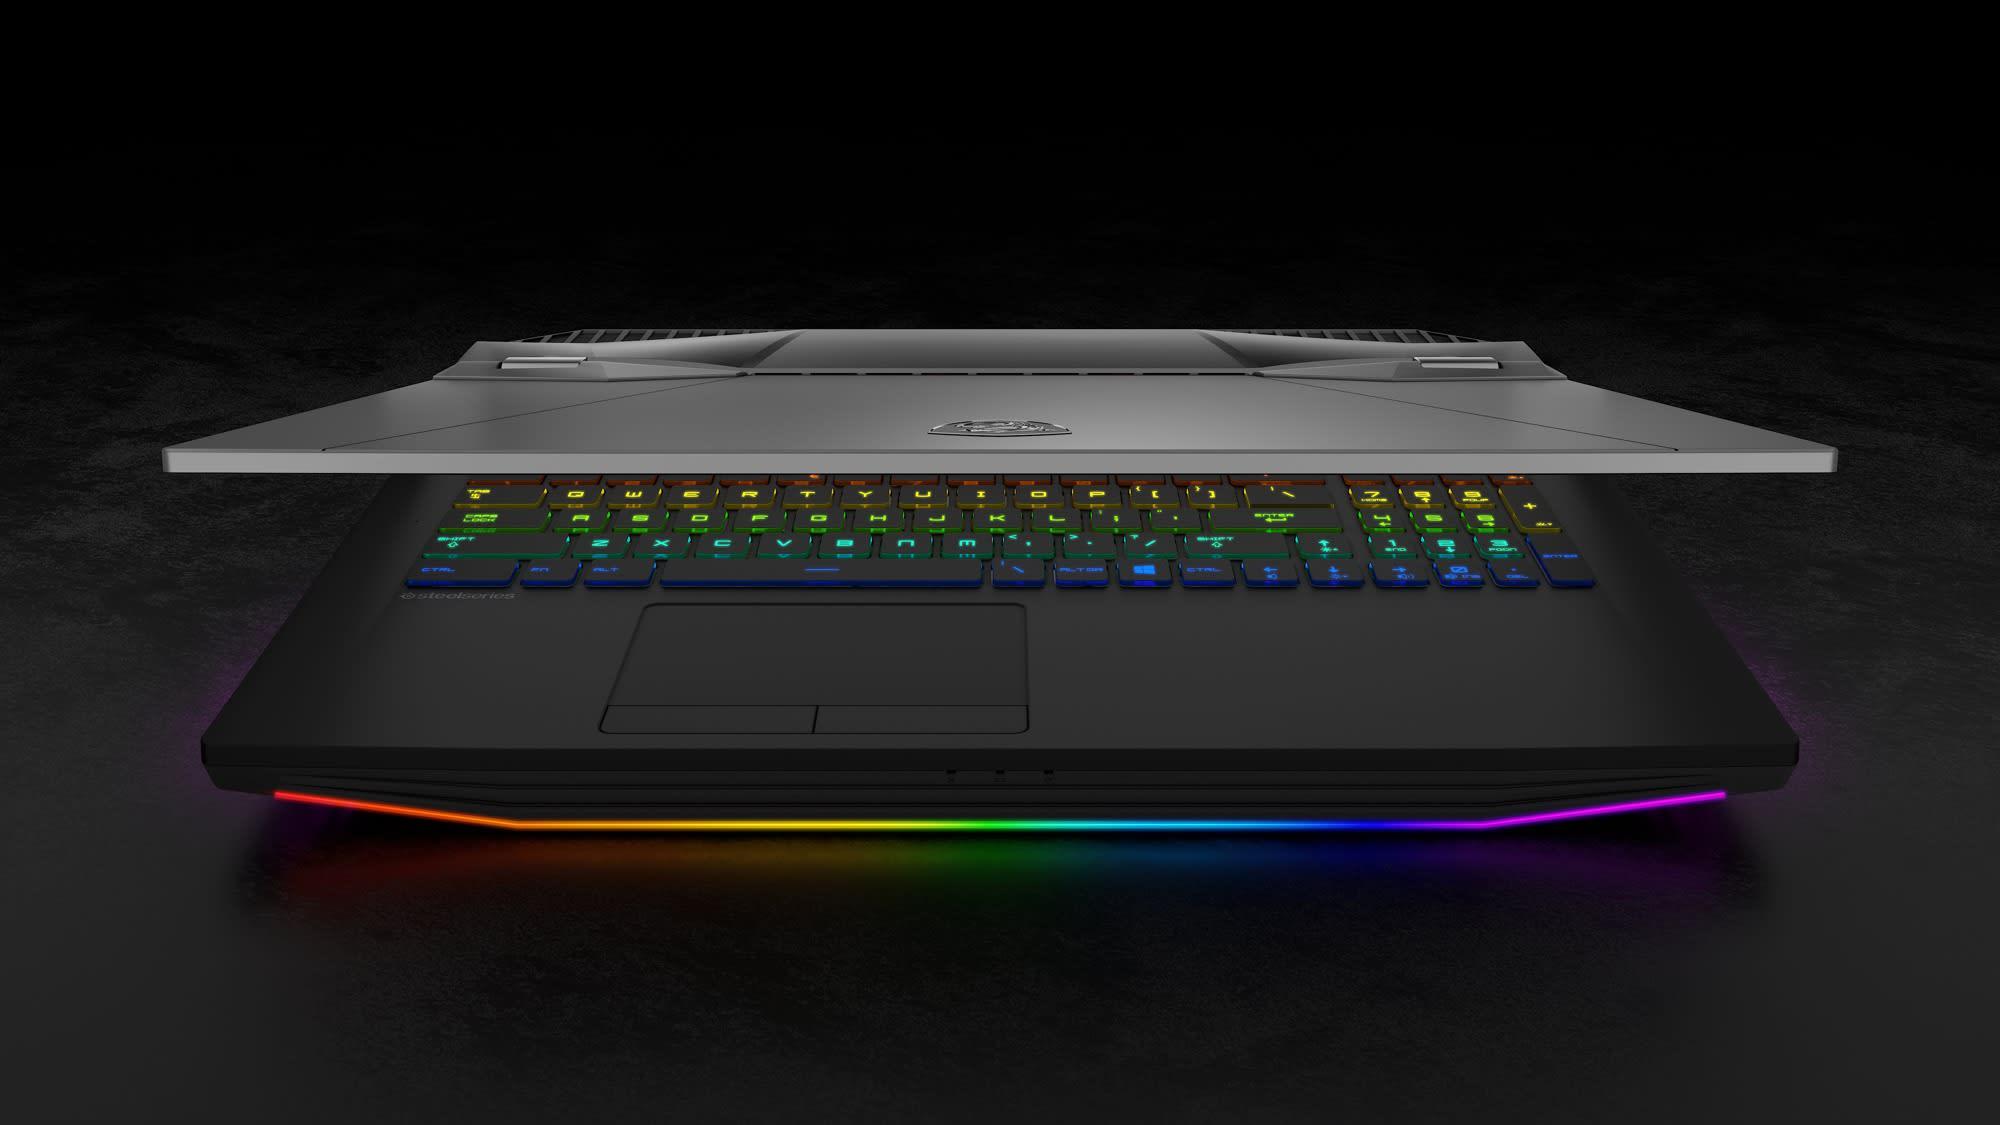 MSI crams an unlocked, desktop-class Core i9 into its new laptop